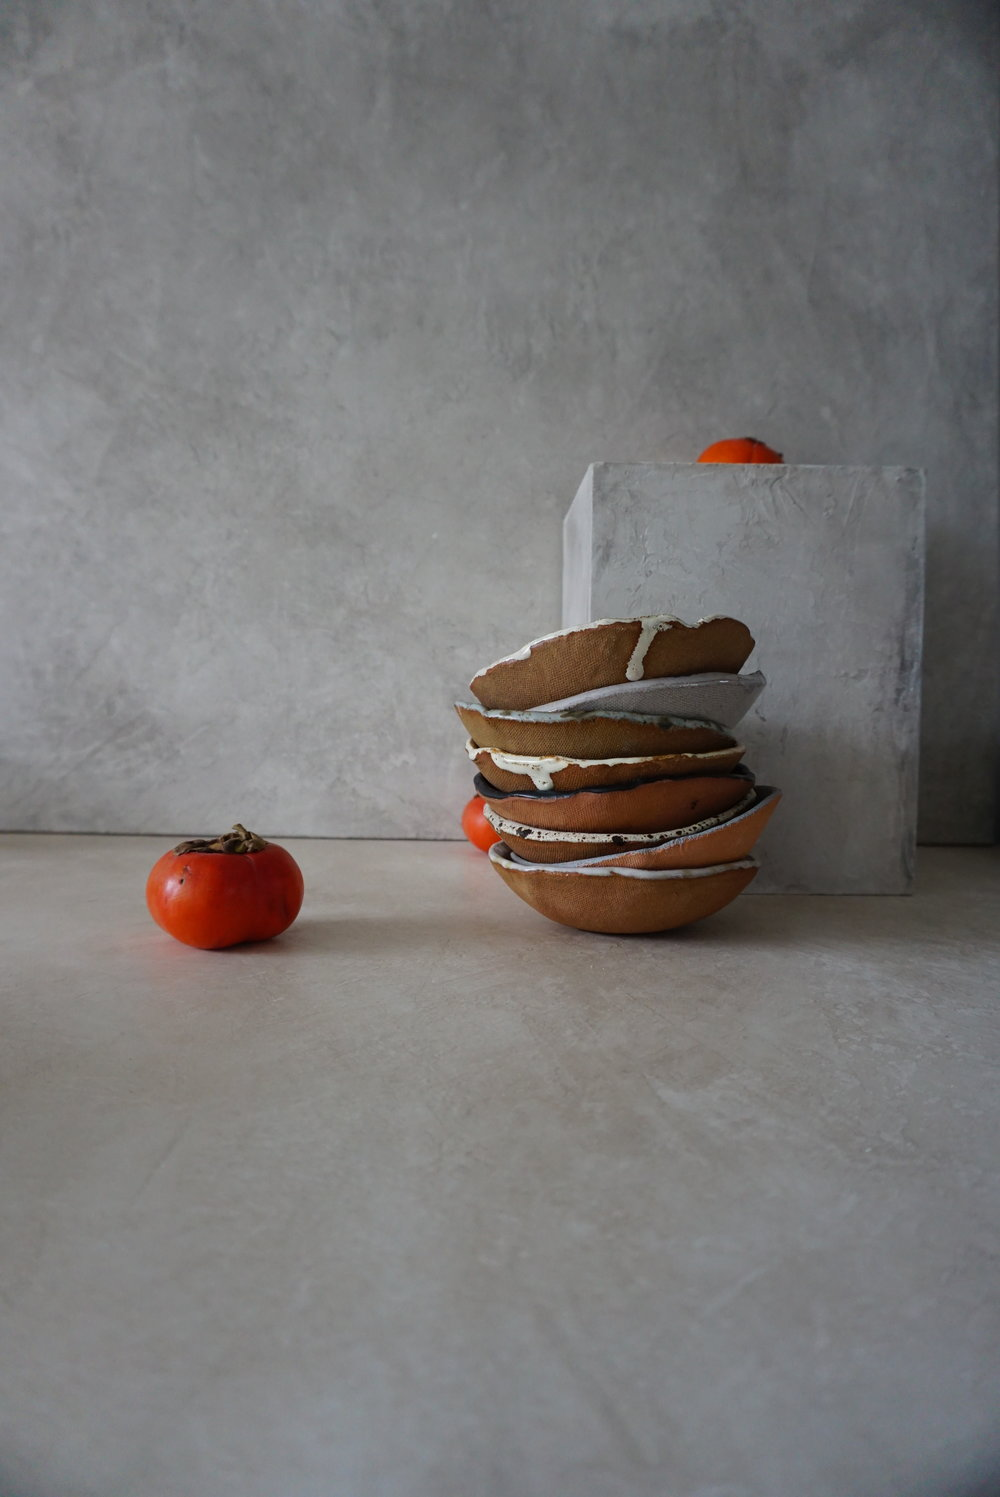 "Granola bowl 5-6"" dia multiple glaze options available SRP $18 USD"